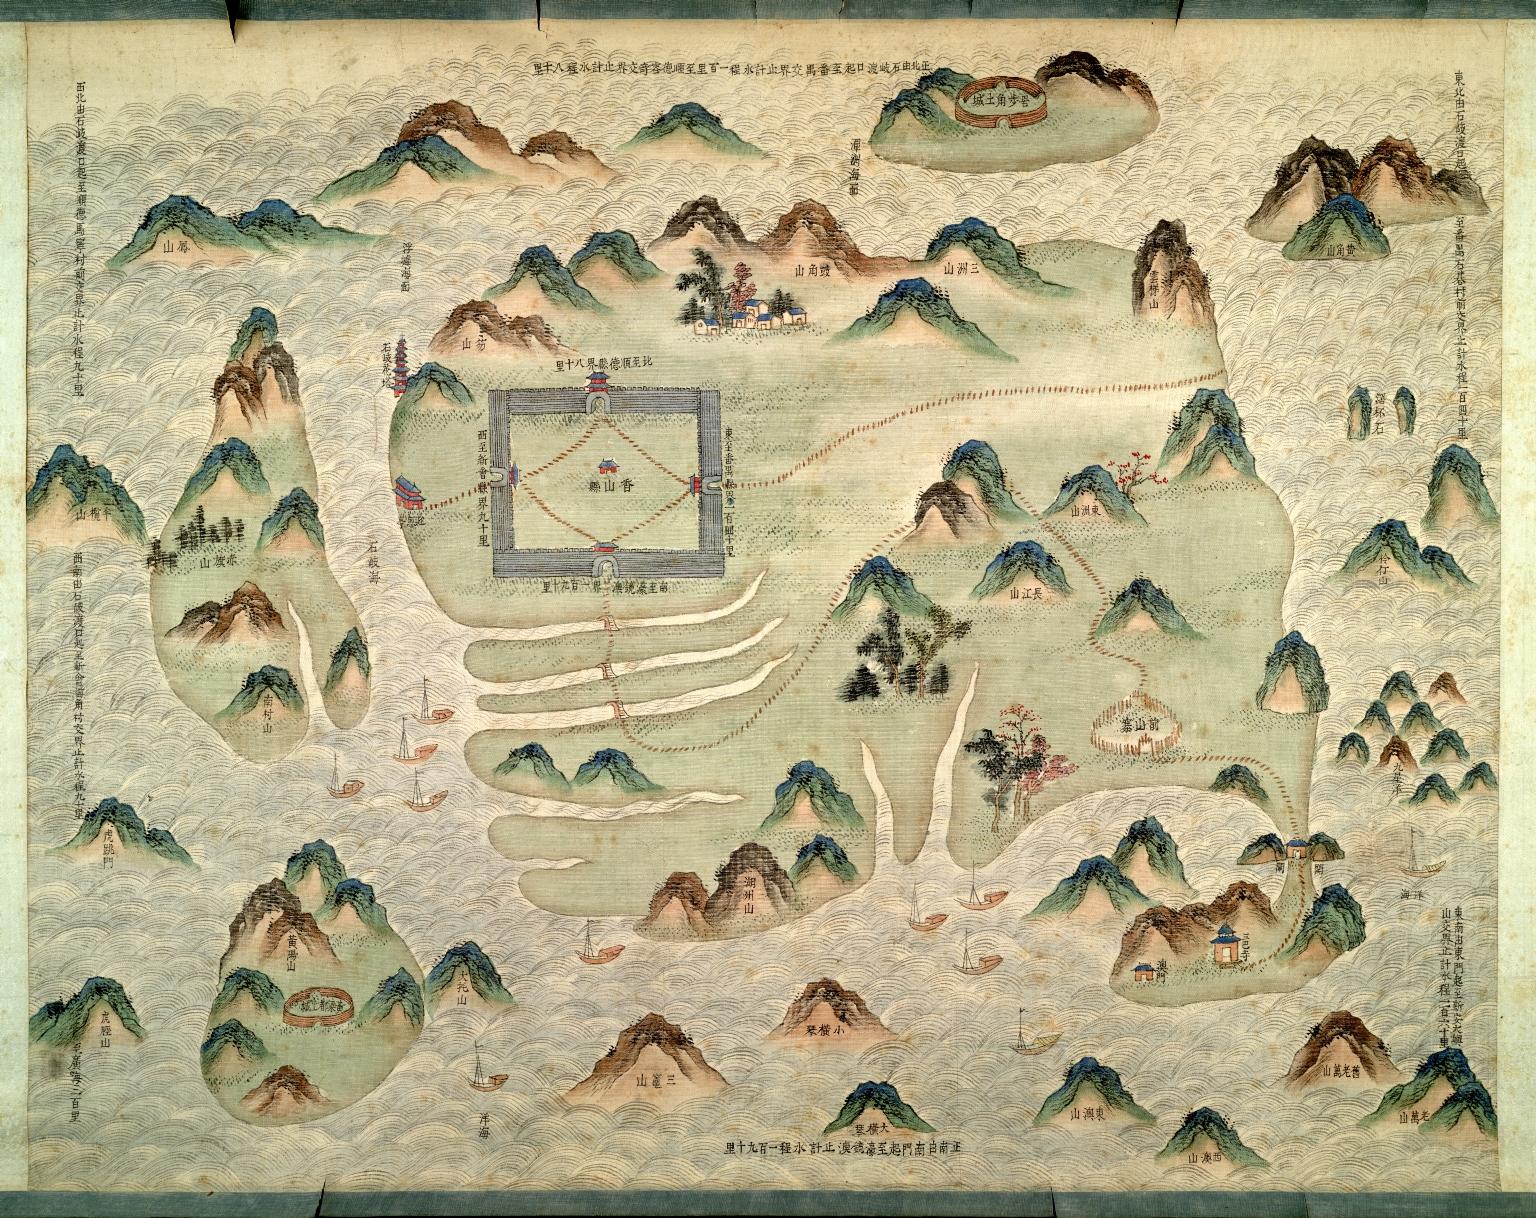 廣州府分縣圖 : 香山縣圖 = Map of Xiangshan Xian